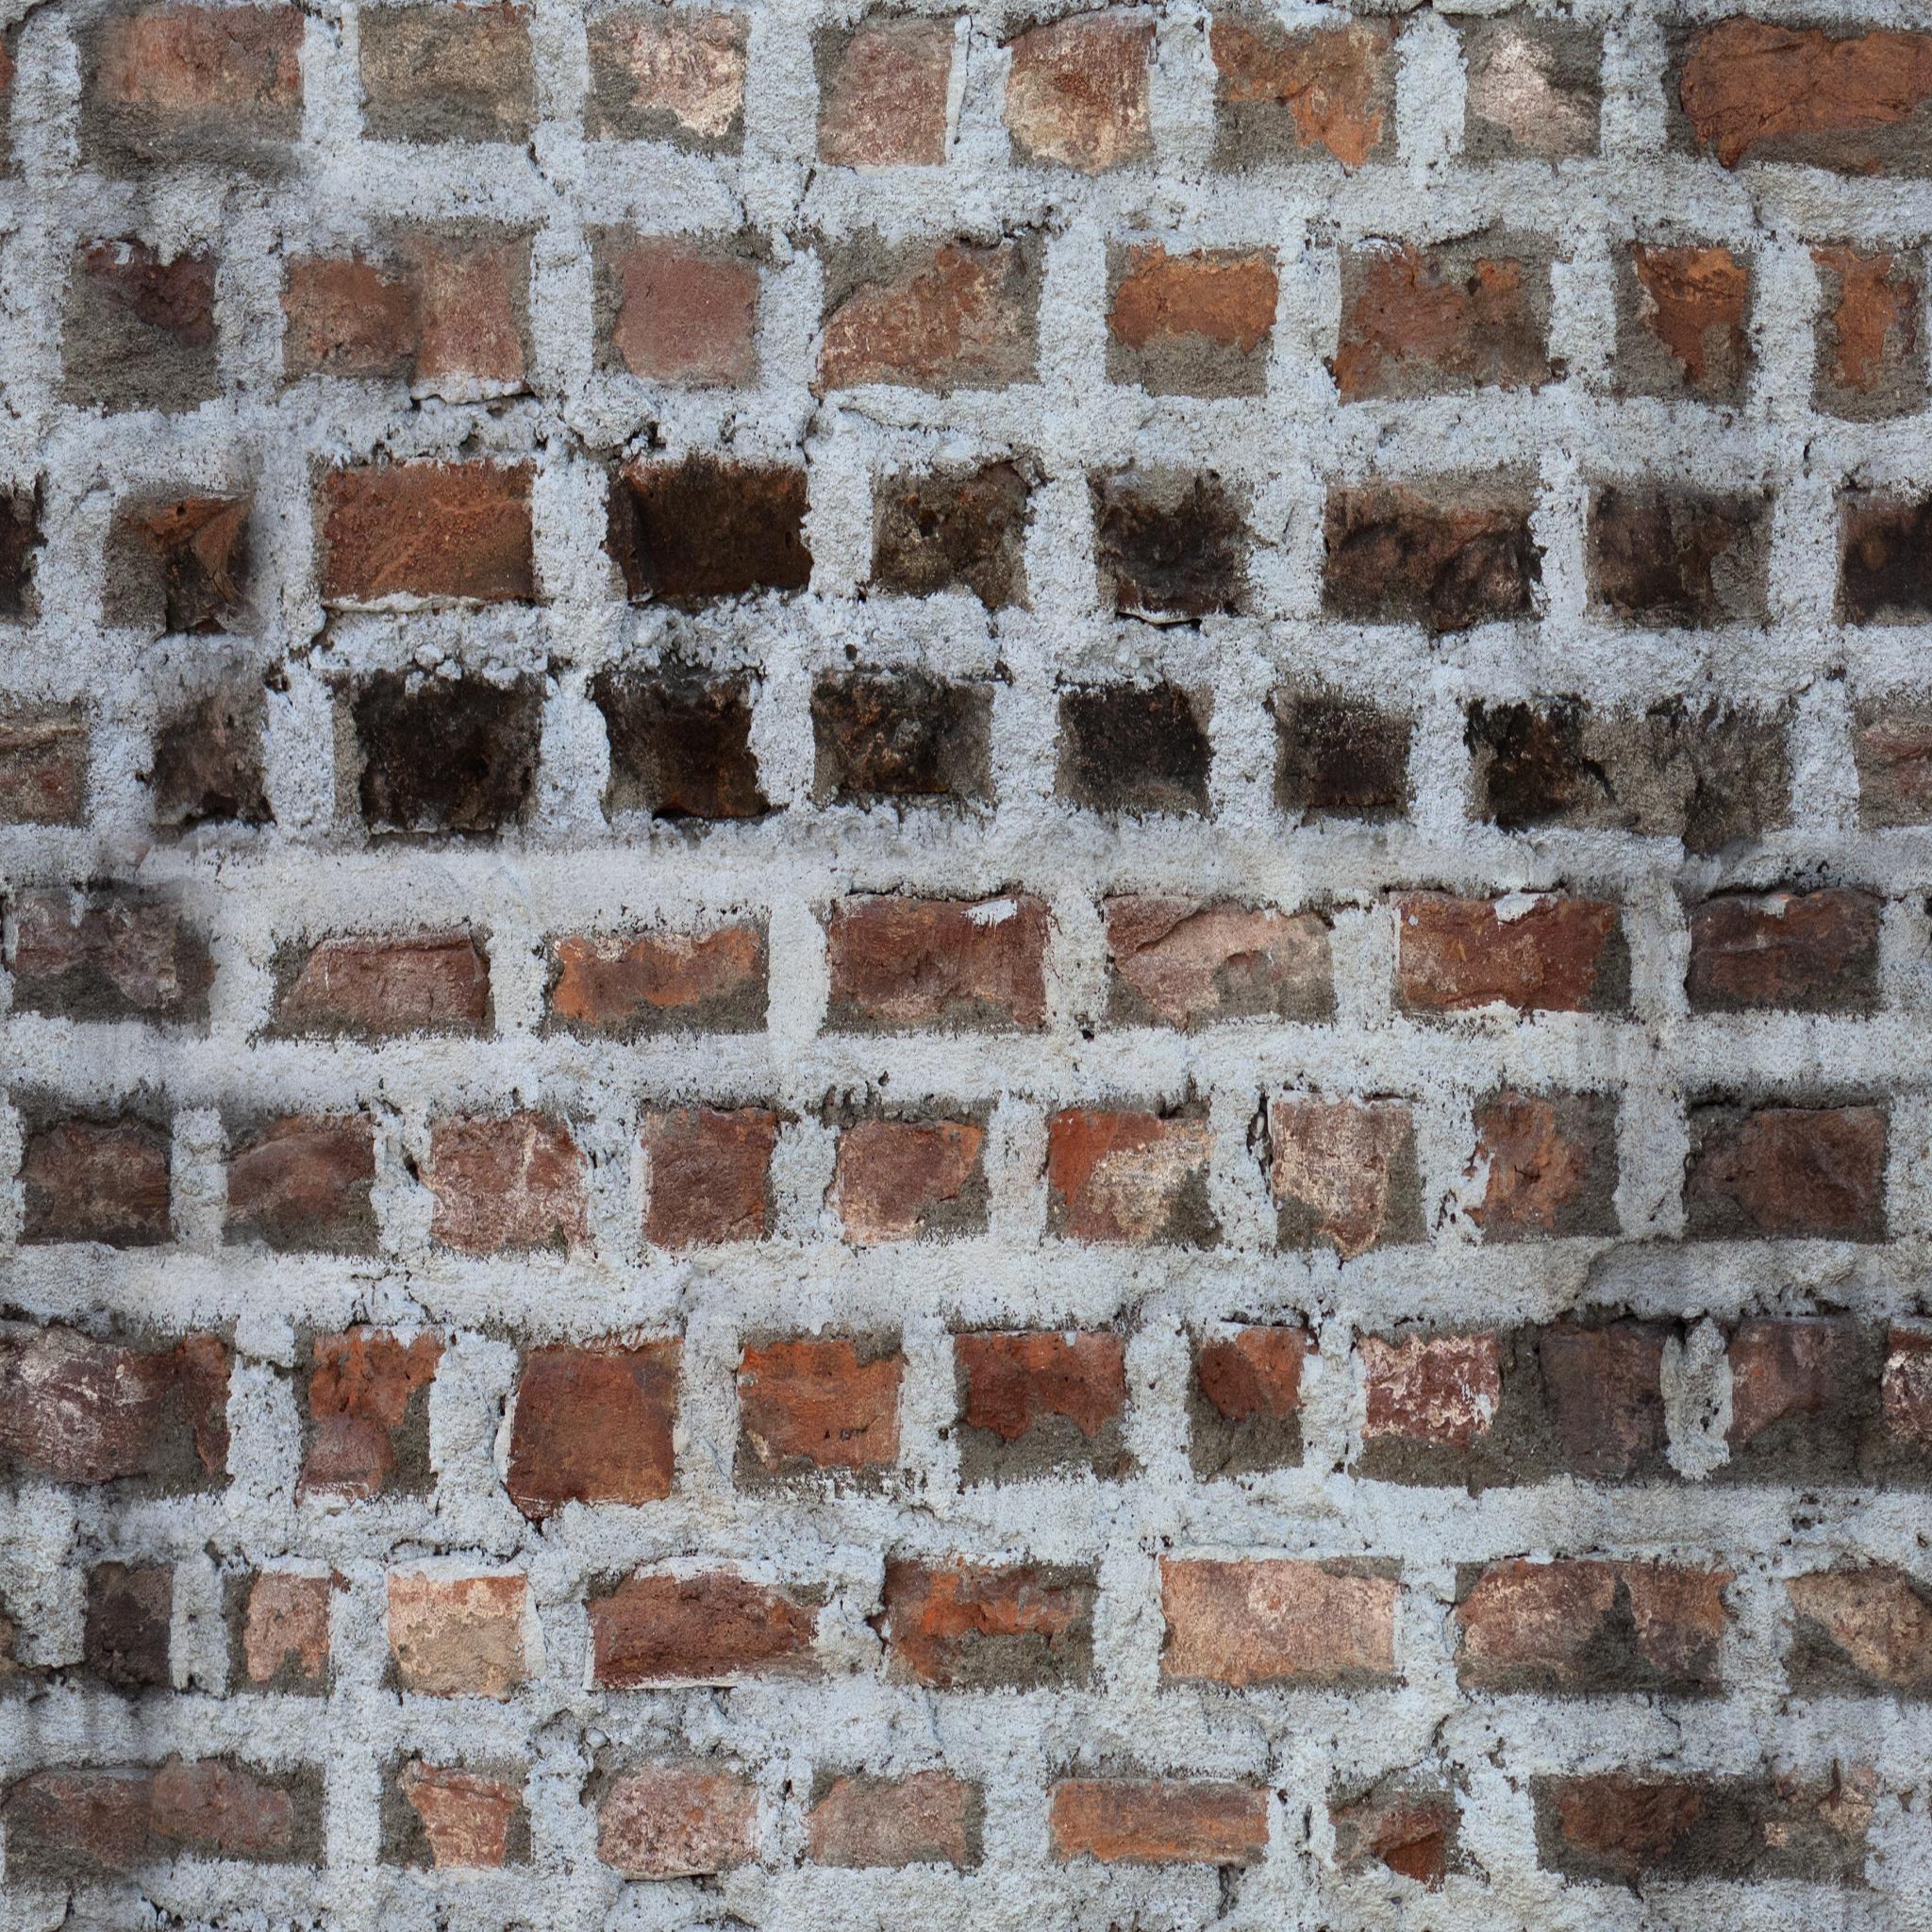 Antique Coco Blend Brick.jpg